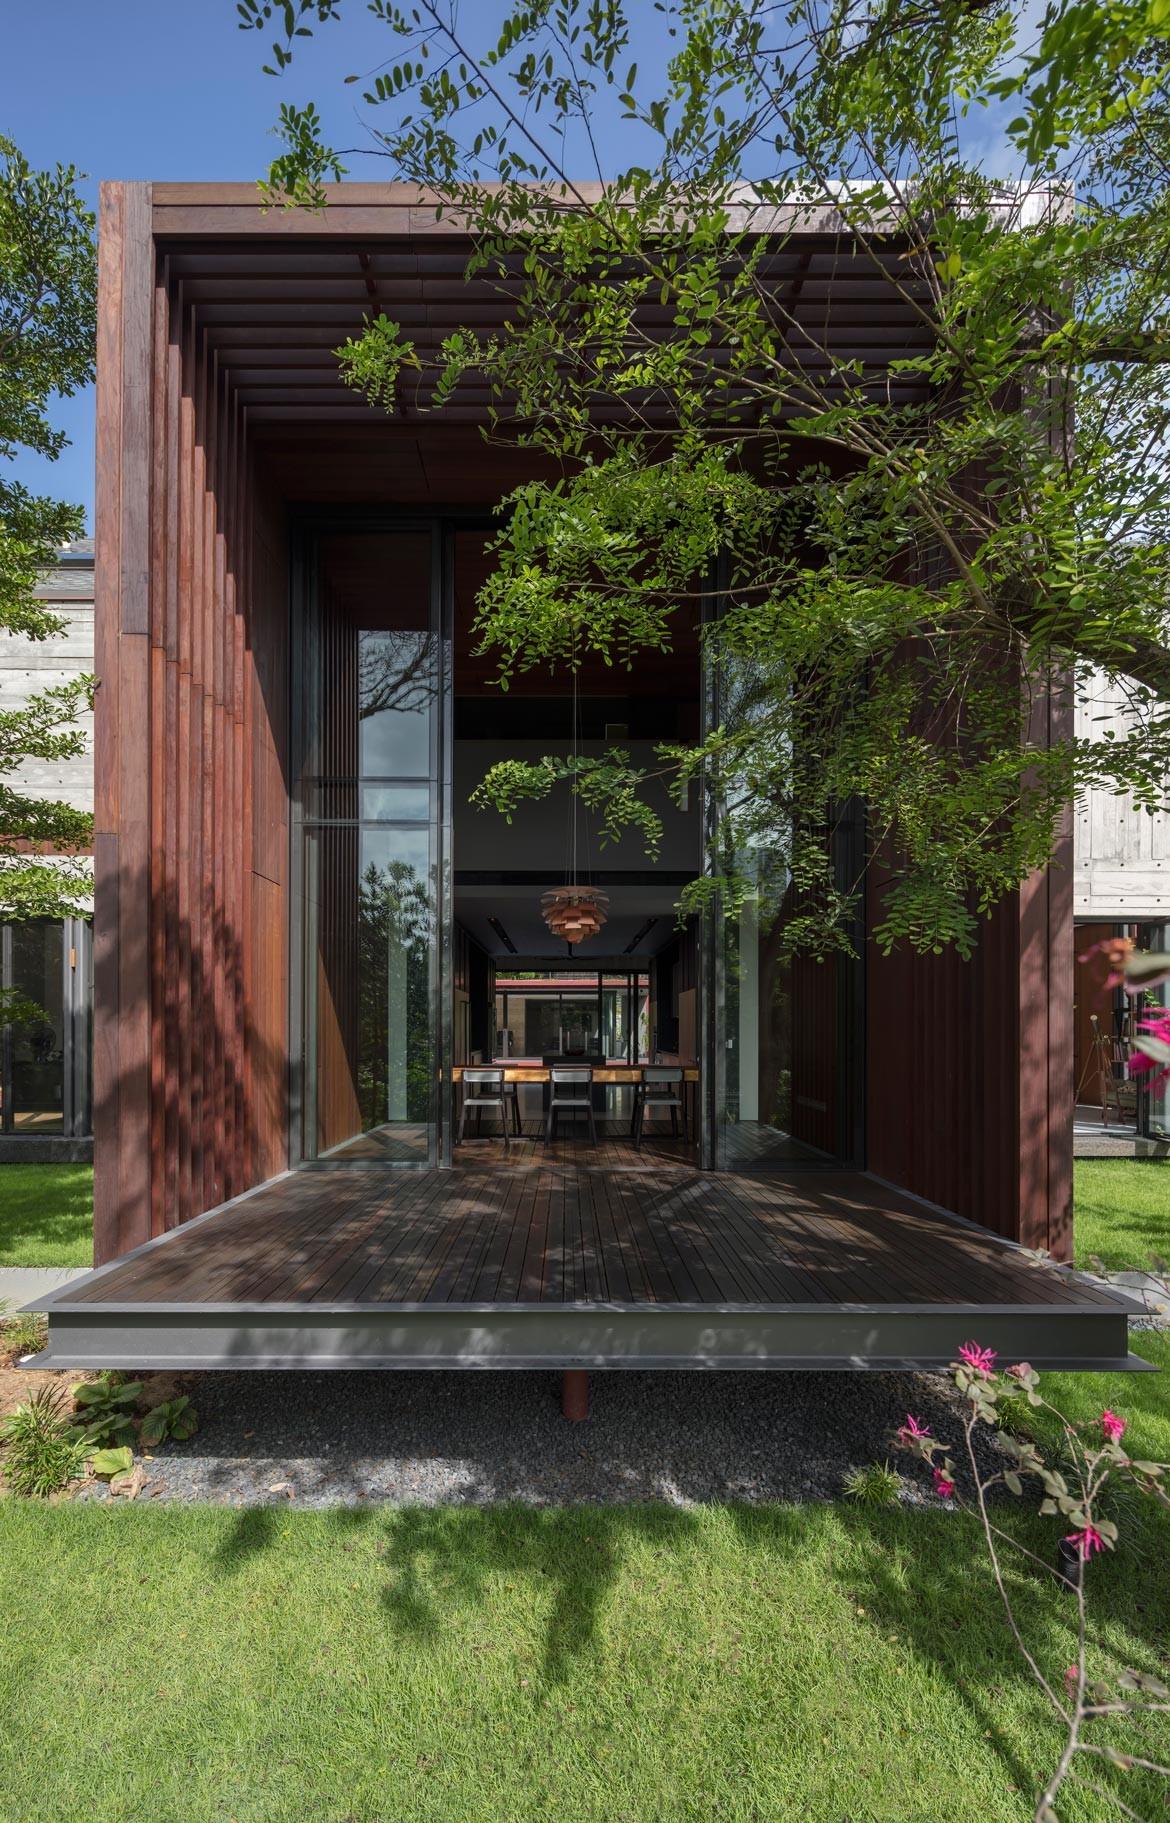 Multi-Generational House Photography by Masano Kawana Dining room extension